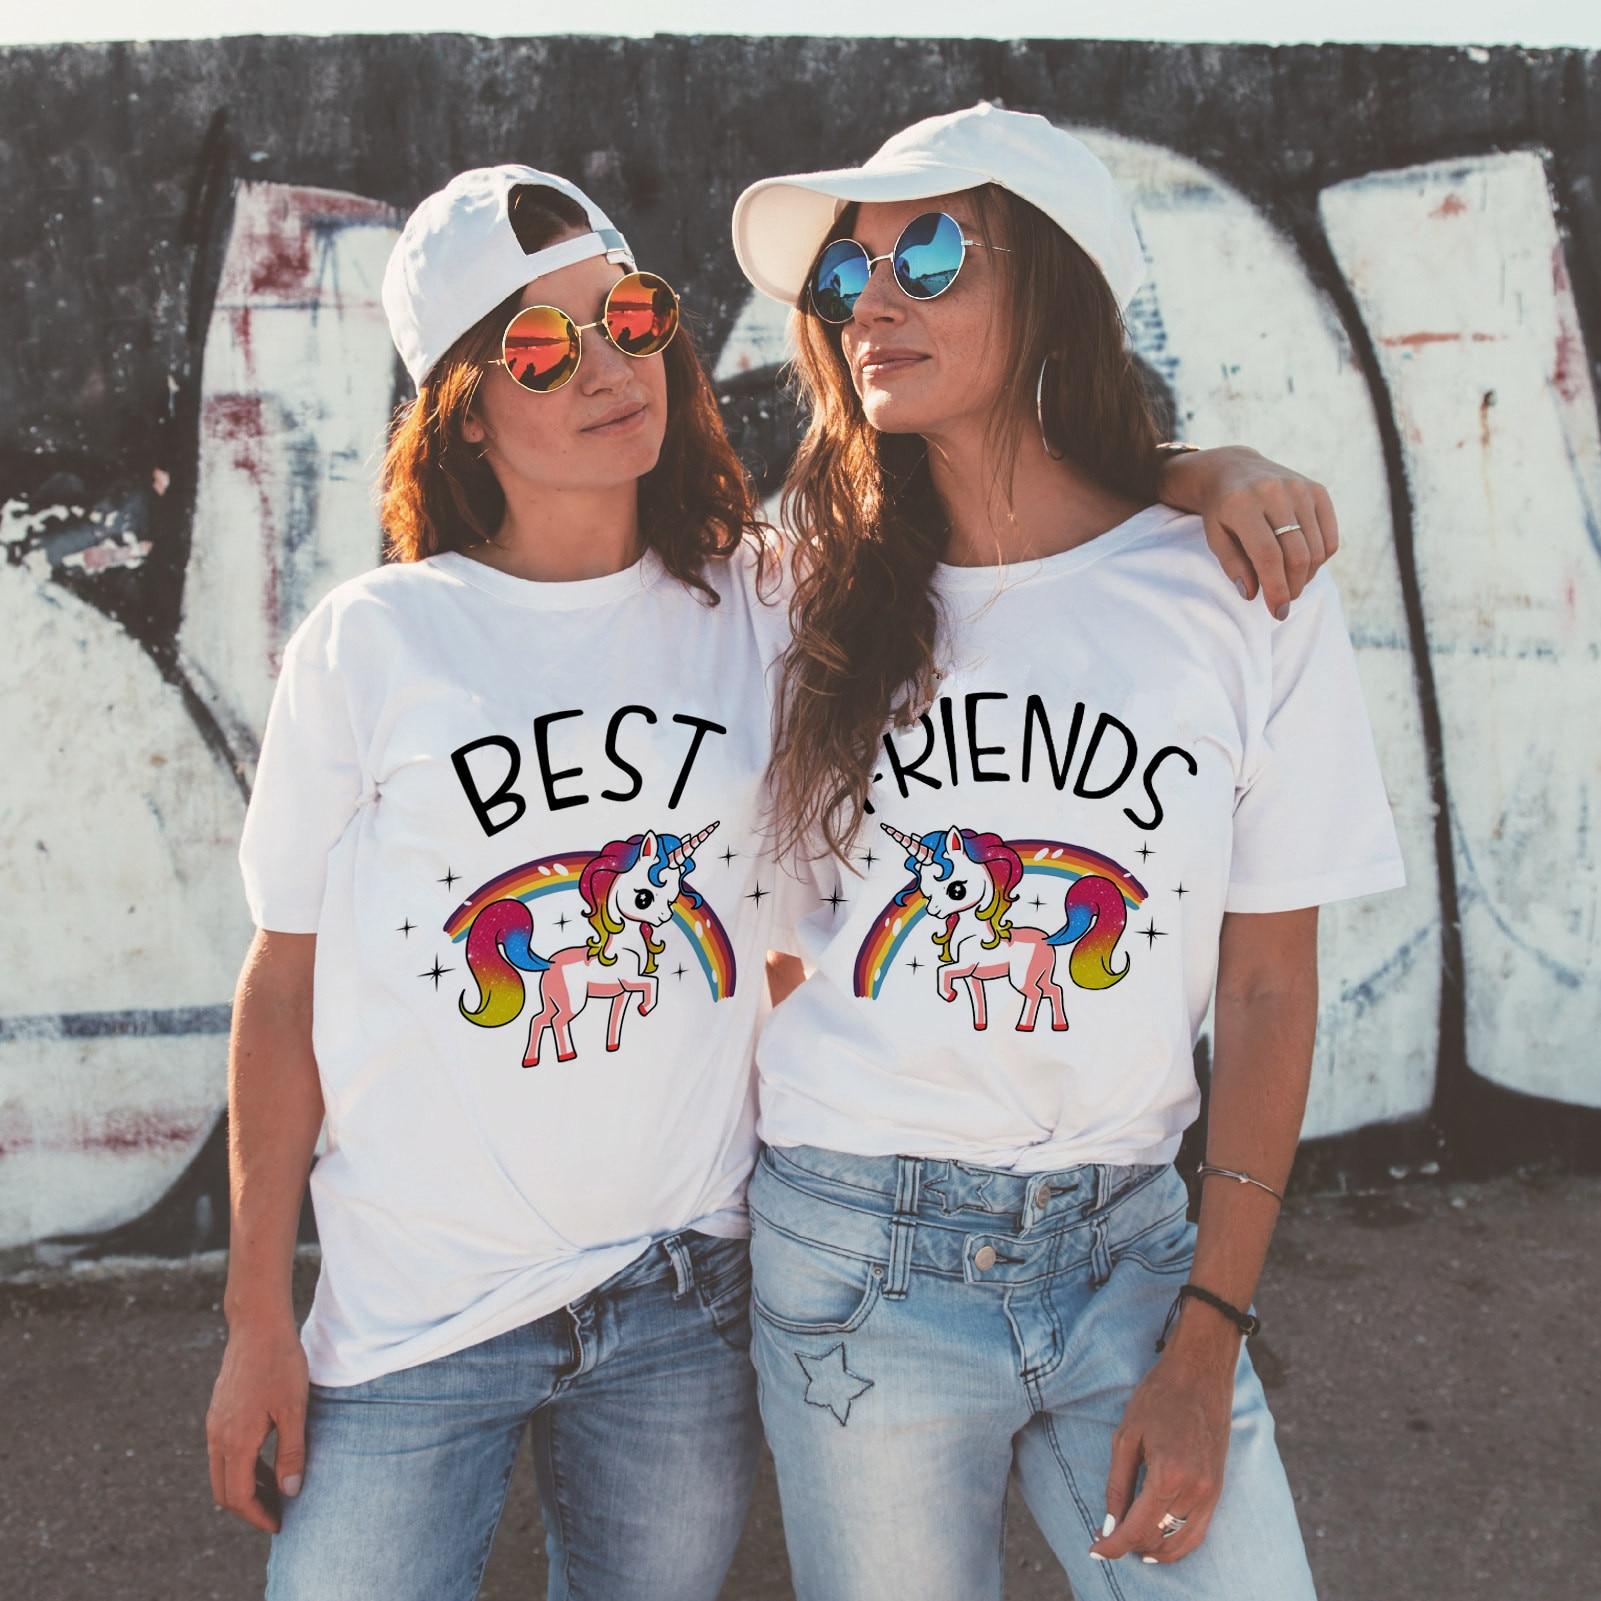 Newest Best Friends T Shirt Women Harajuku Kawaii BFF T-shirt 90s Graphic Cartoon Tshirt Funny Fashion Top Tees Streetwea Female